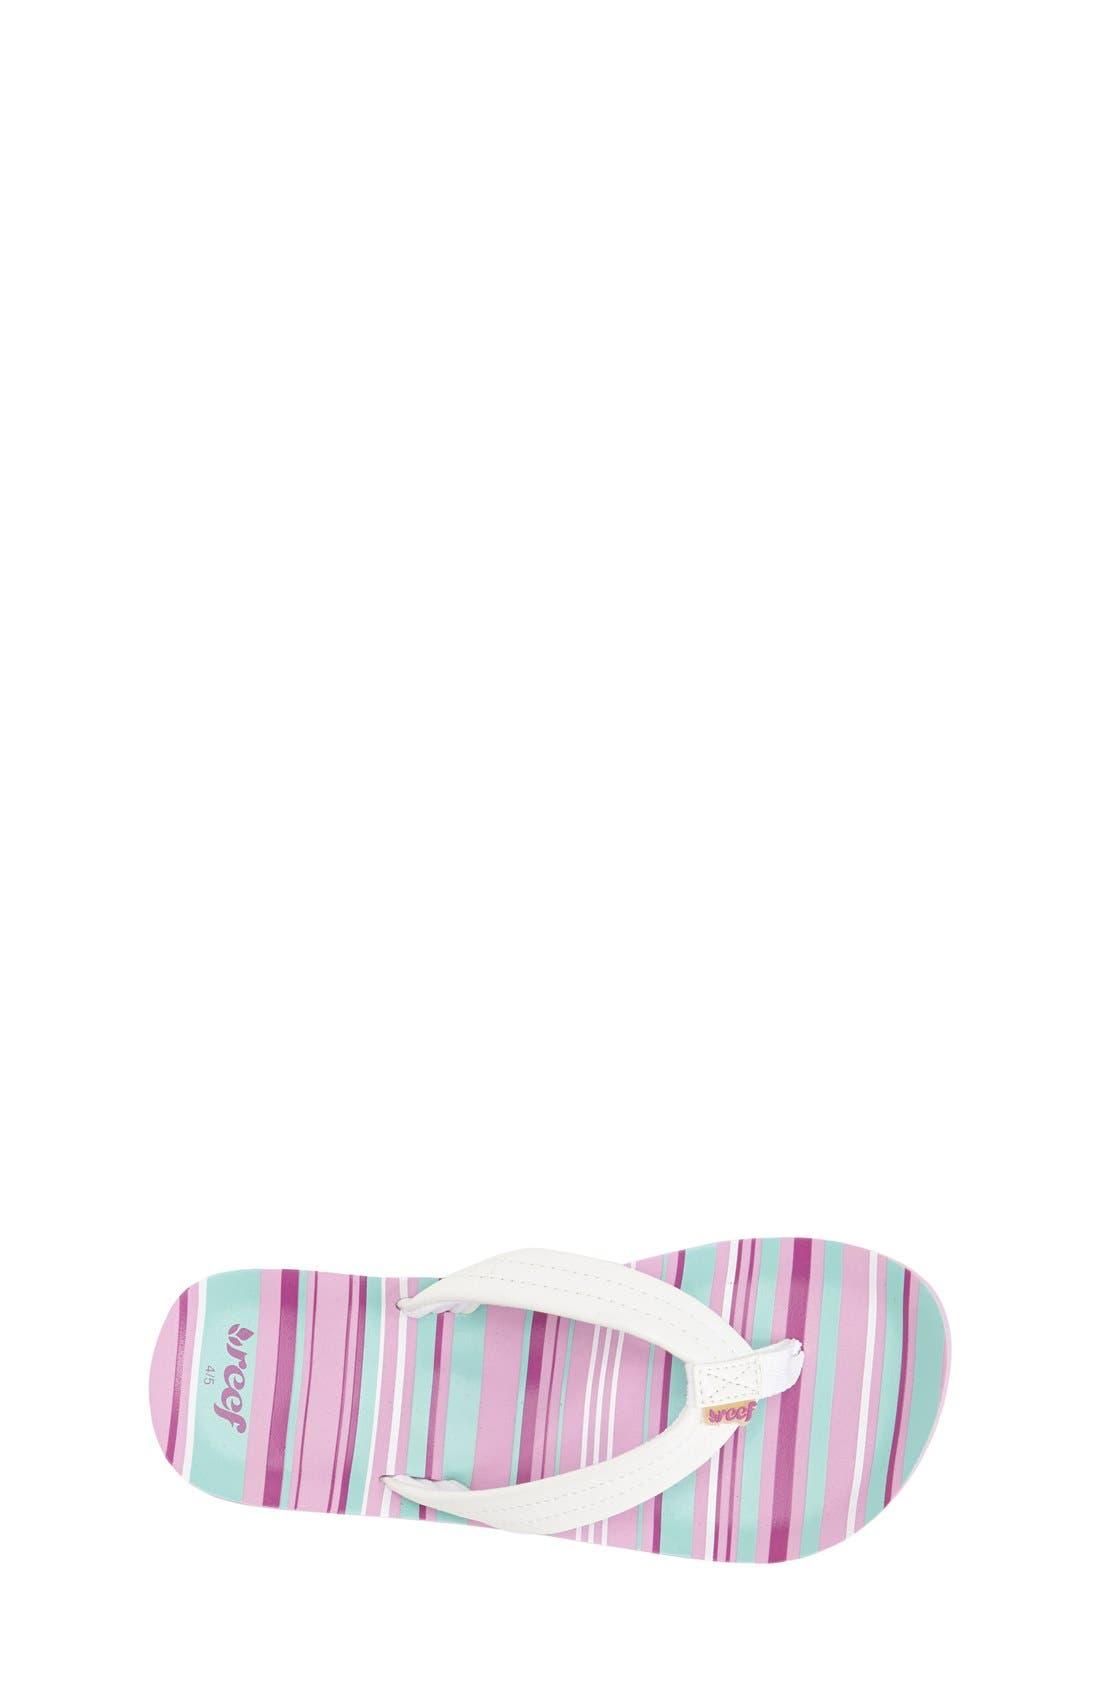 'Little Ahi' Thong Sandal,                             Alternate thumbnail 40, color,